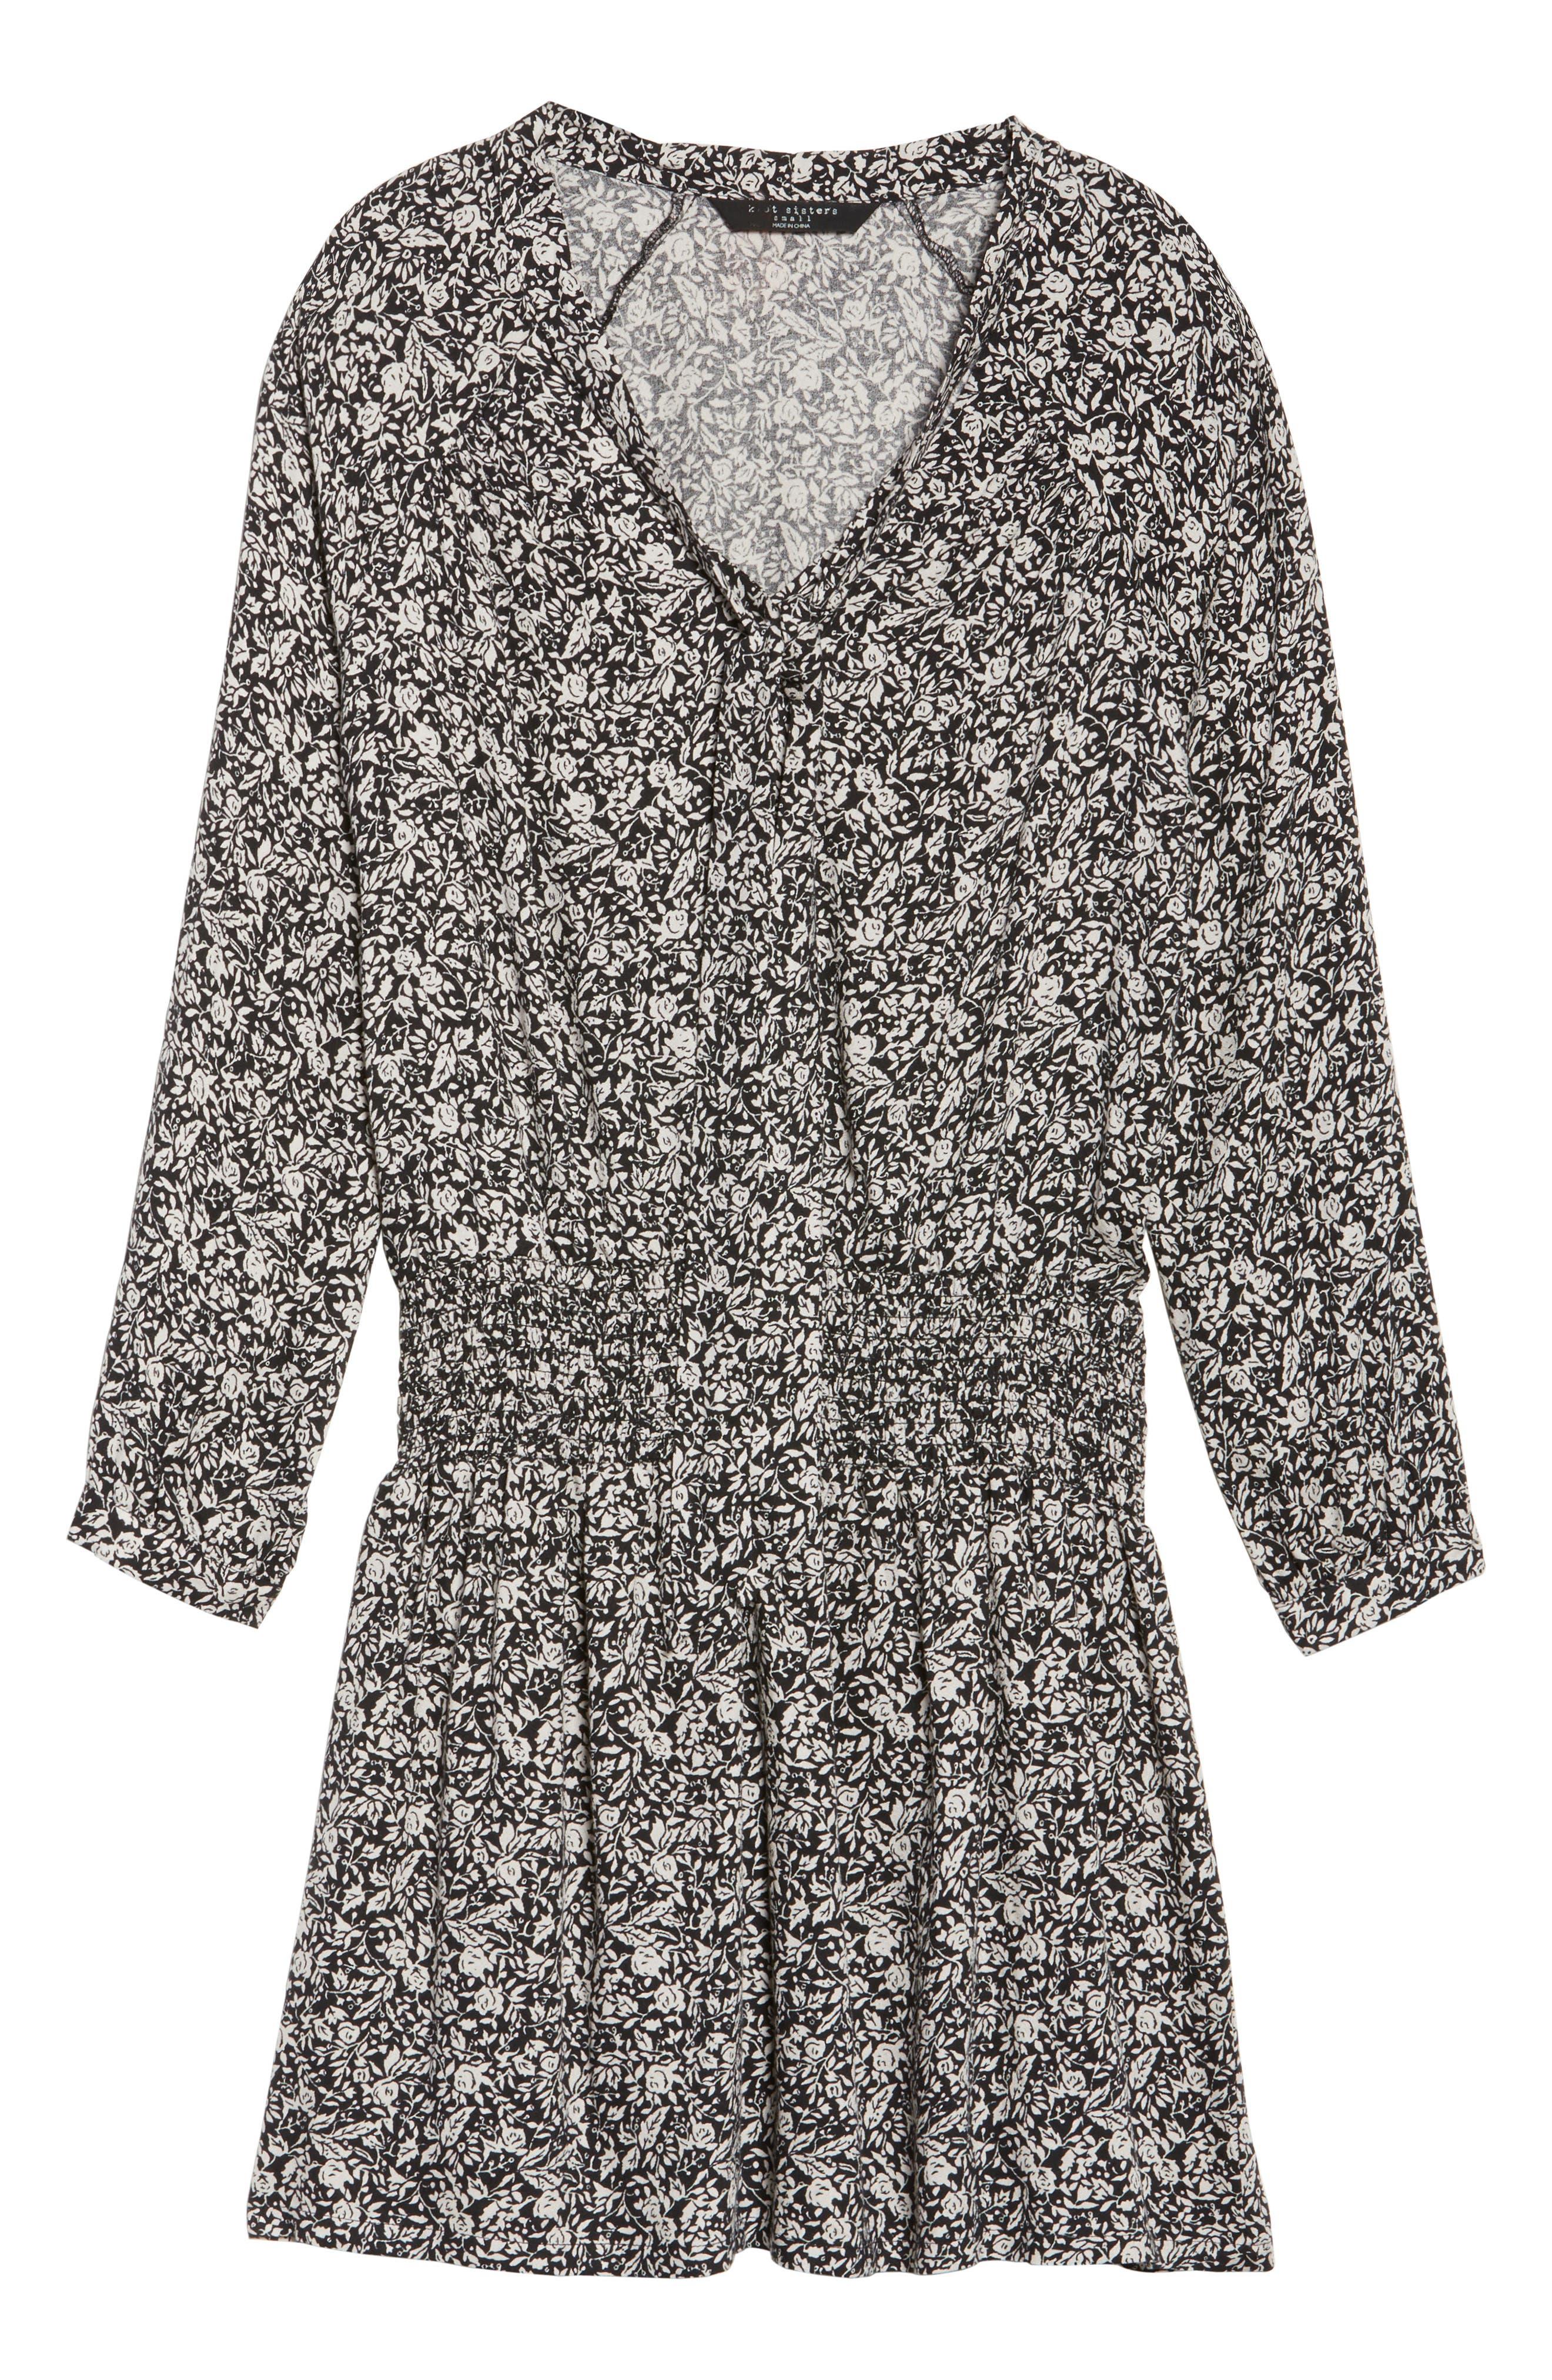 Ivy Blouson Dress,                             Alternate thumbnail 6, color,